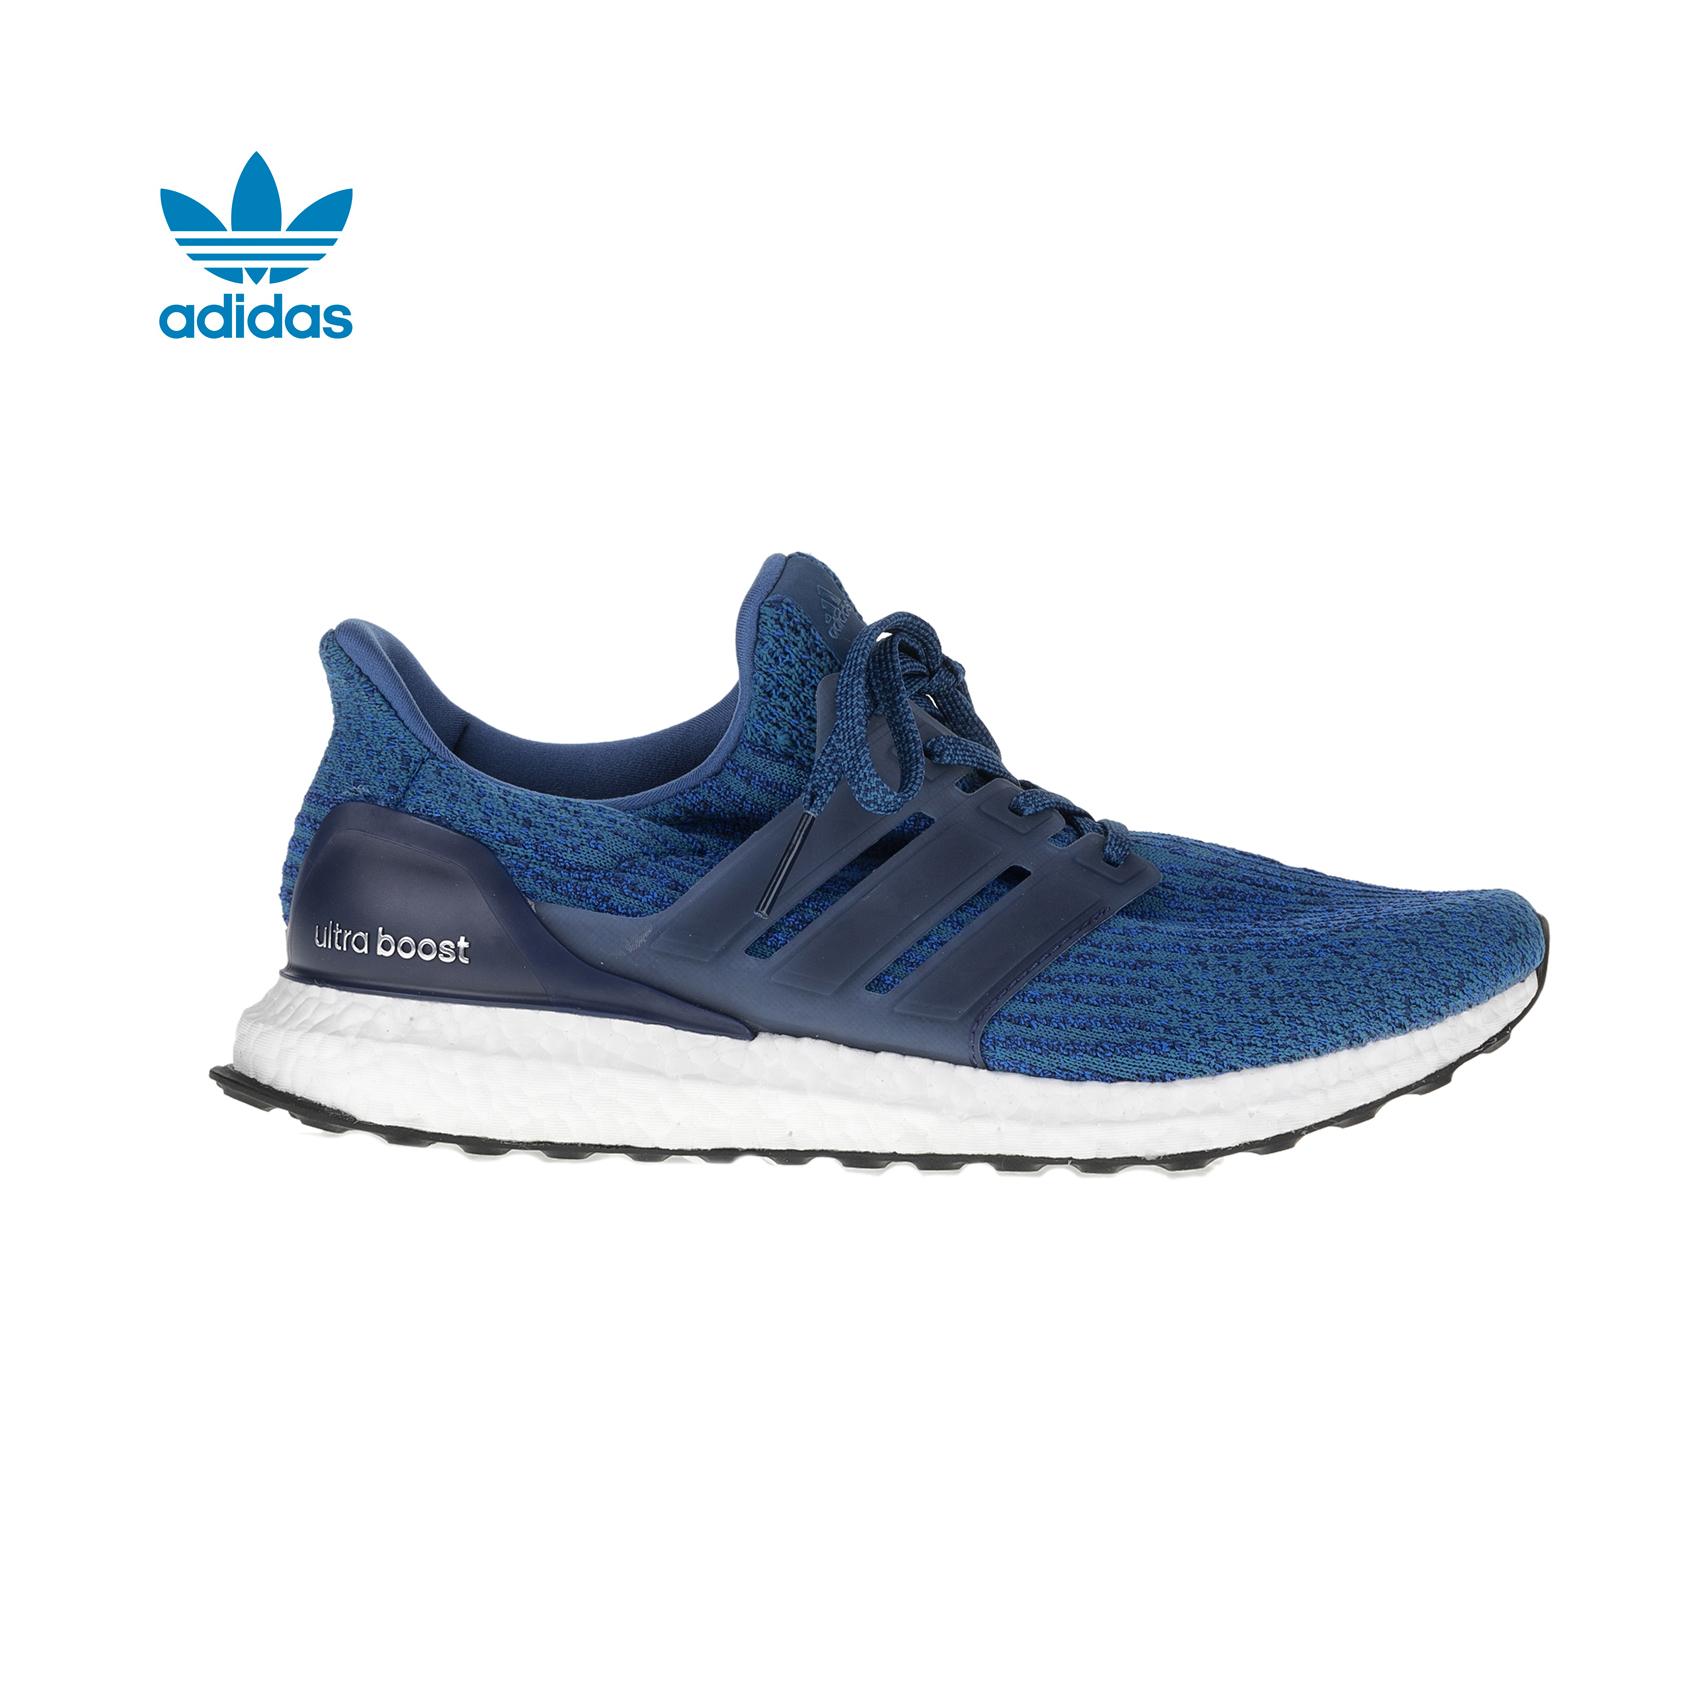 adidas Originals - Ανδρικά παπούτσια τρεξίματος adidas UltraBOOST μπλε ανδρικά παπούτσια αθλητικά running